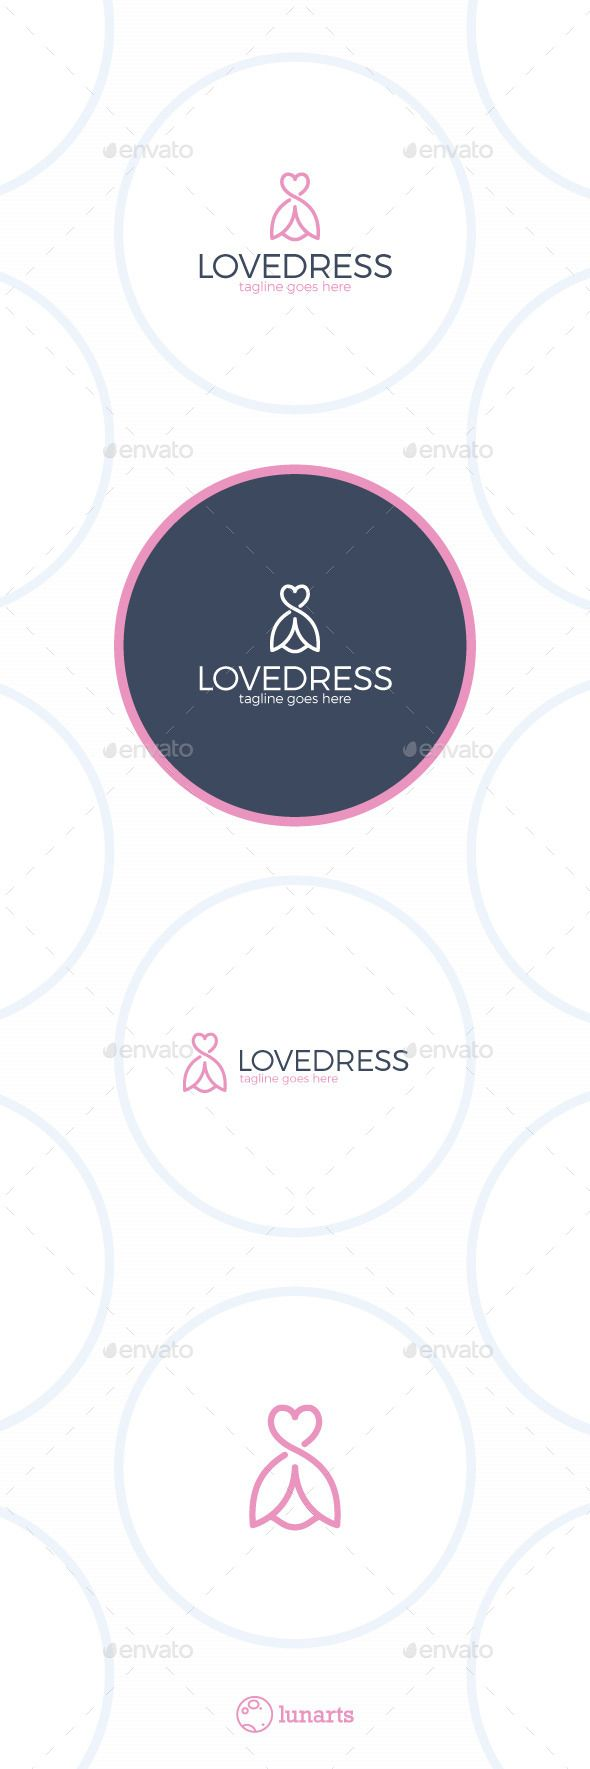 Love Dress Logo - Flower Line  #hanger #heart #Ladies Fashion • Available here → http://graphicriver.net/item/love-dress-logo-flower-line/12935981?s_rank=245&ref=pxcr